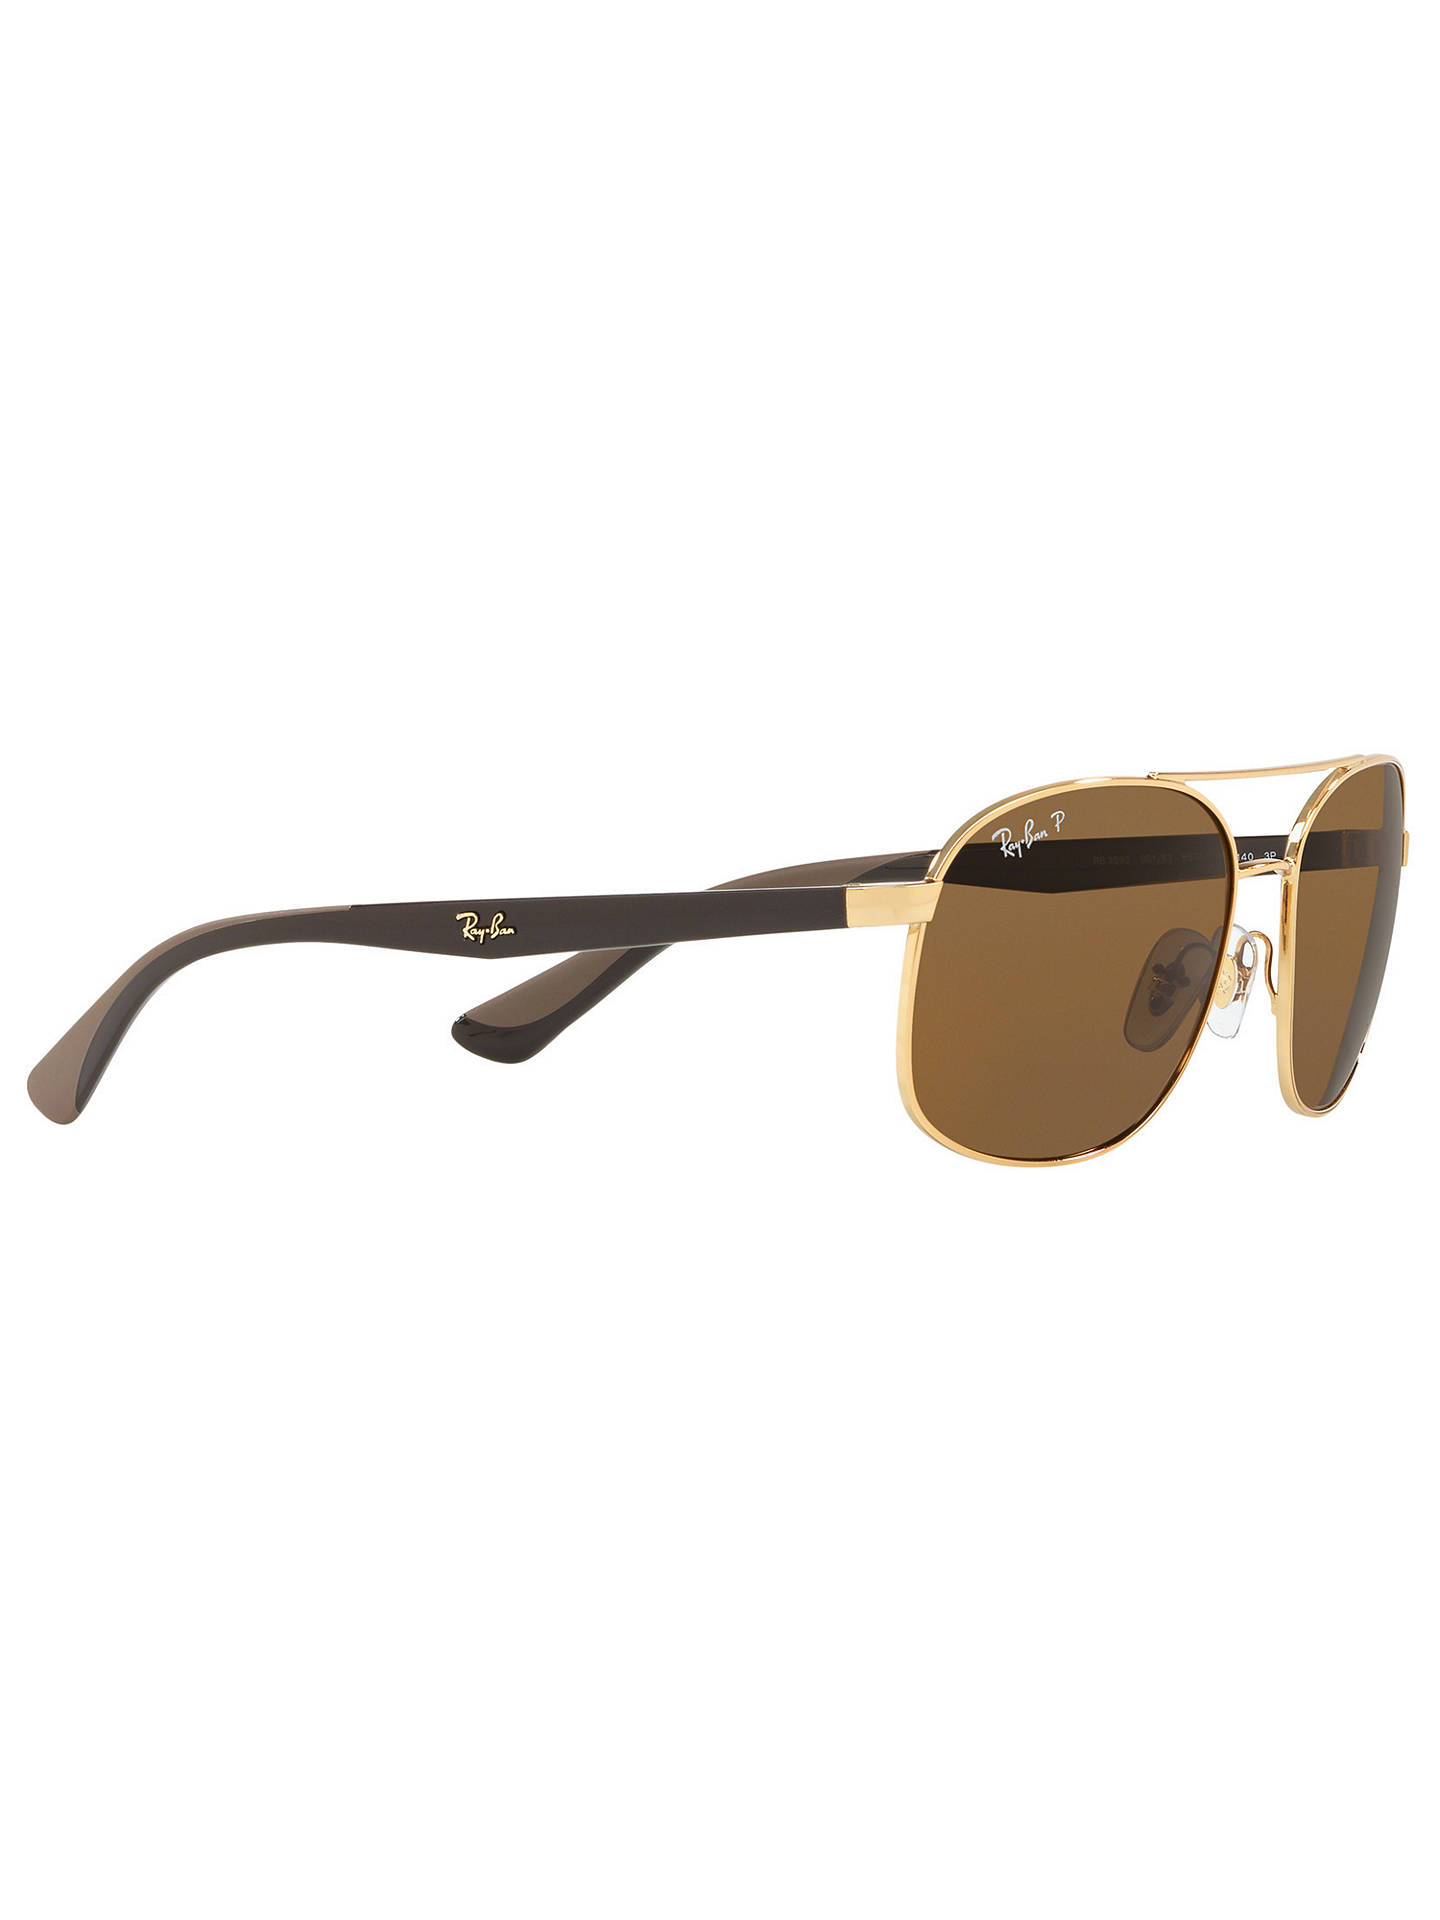 ec420e6407b7c Ray-Ban RB3593 Unisex Polarised Oval Sunglasses at John Lewis   Partners